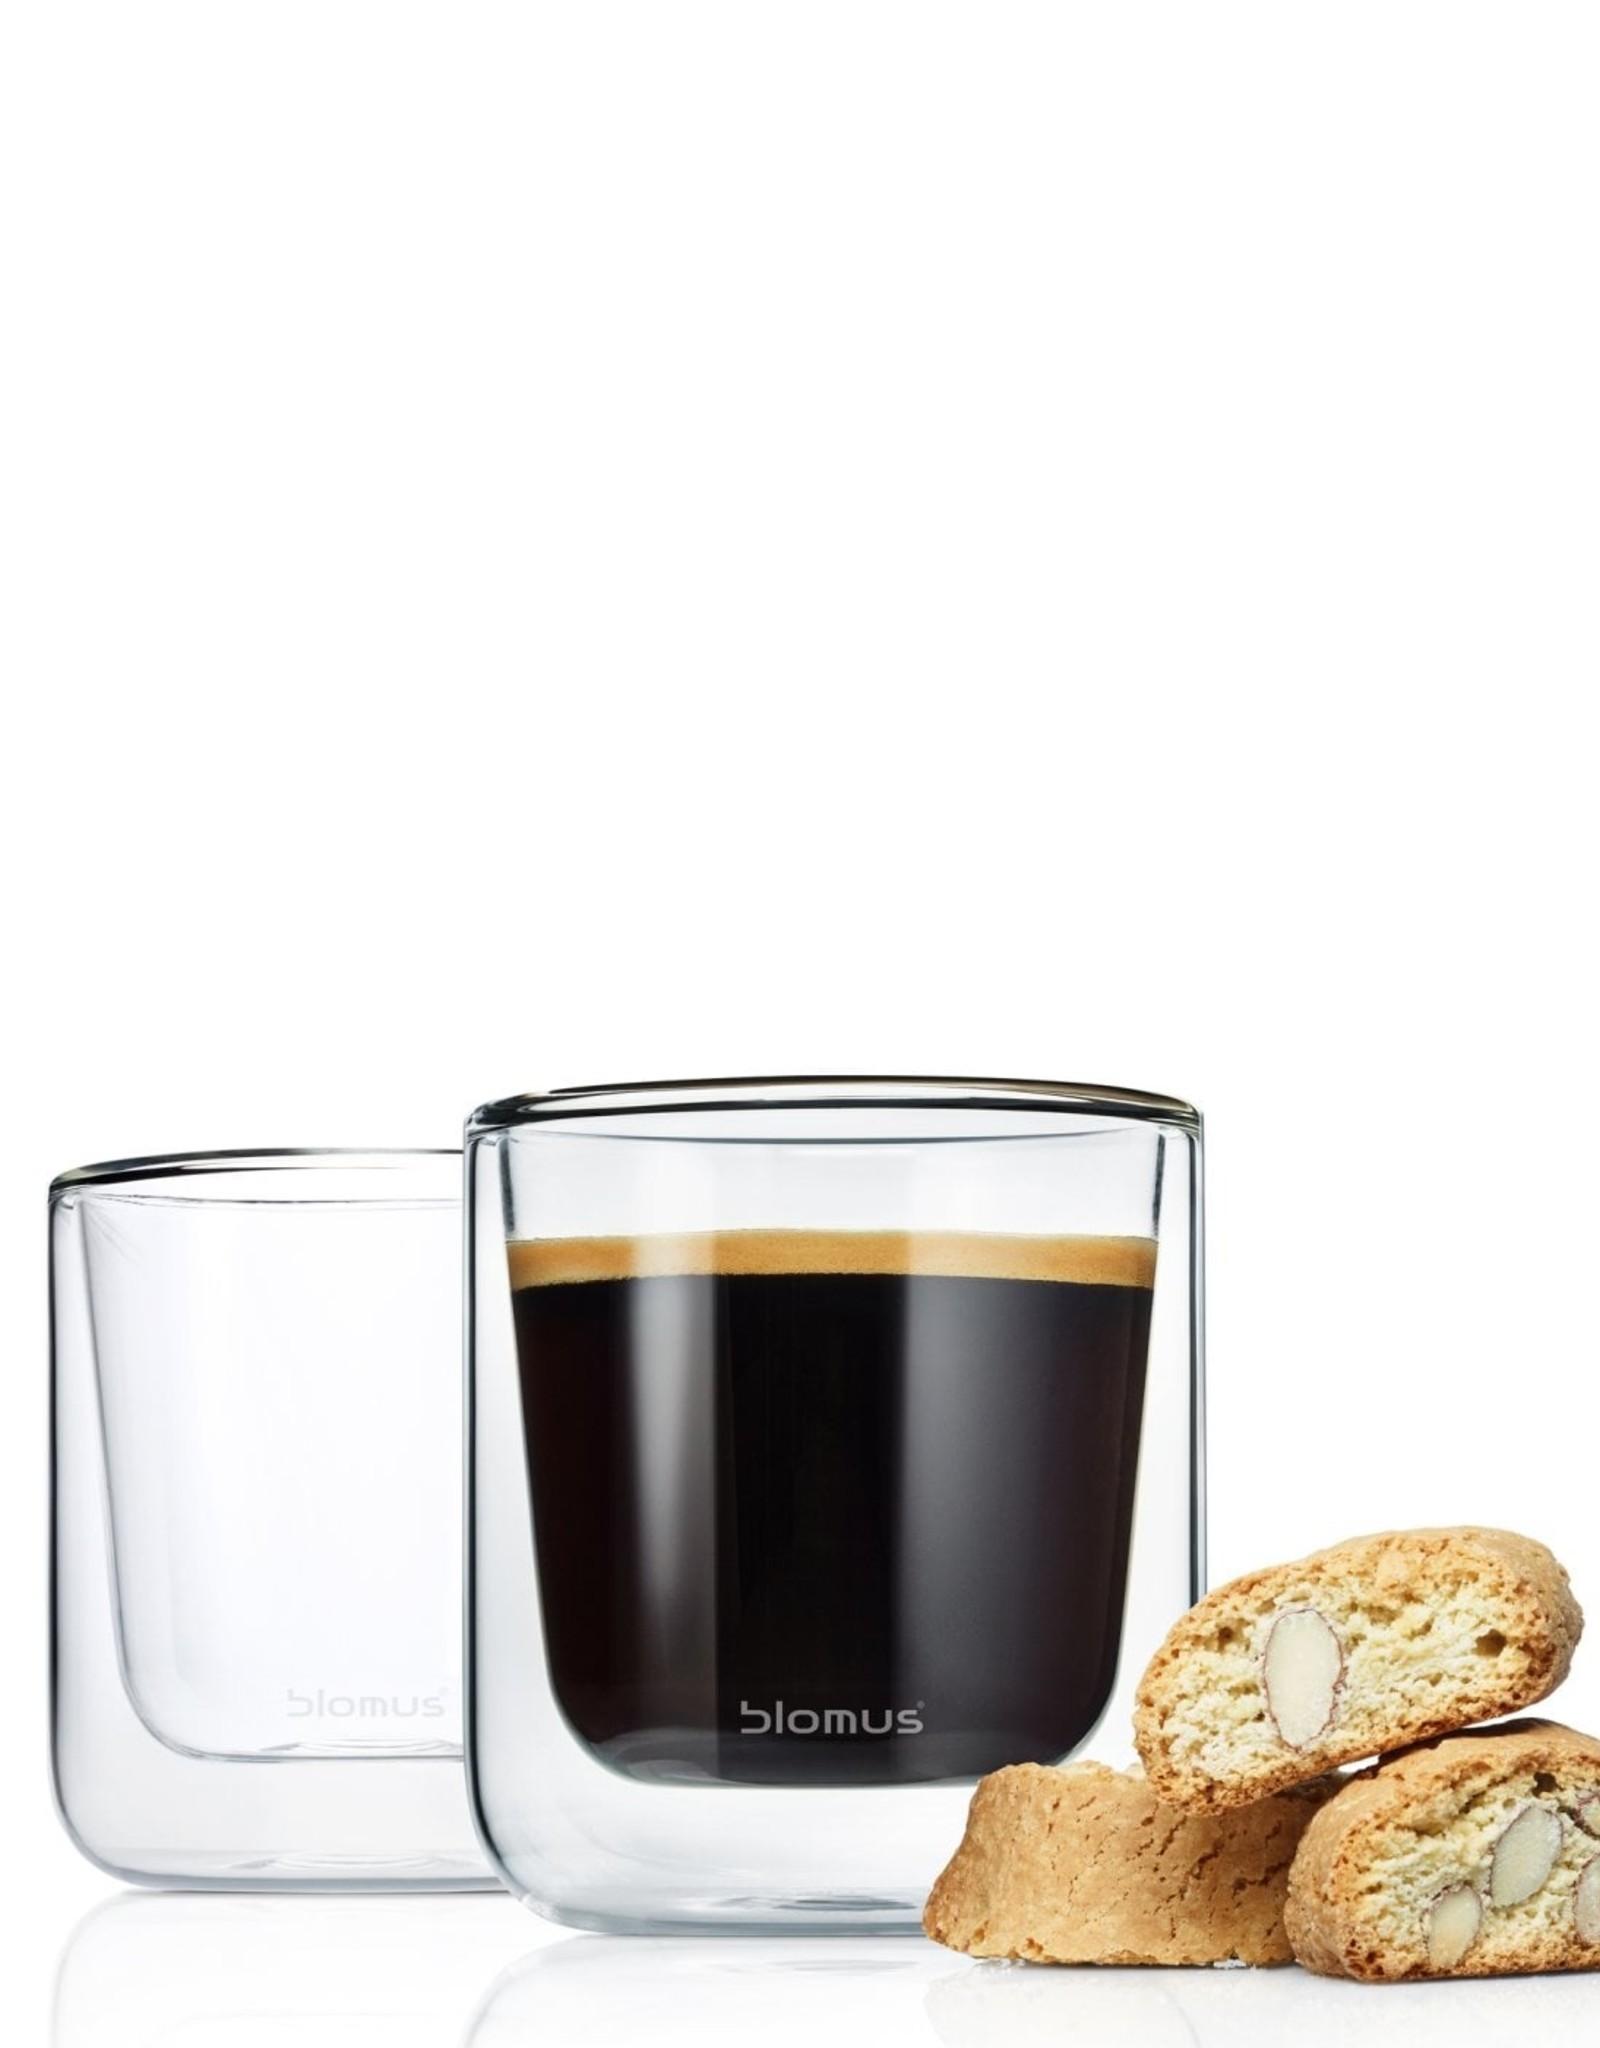 Blomus Blomus Dubbelwandige Glazen Koffie Nero 20 cl - 2 Stuks